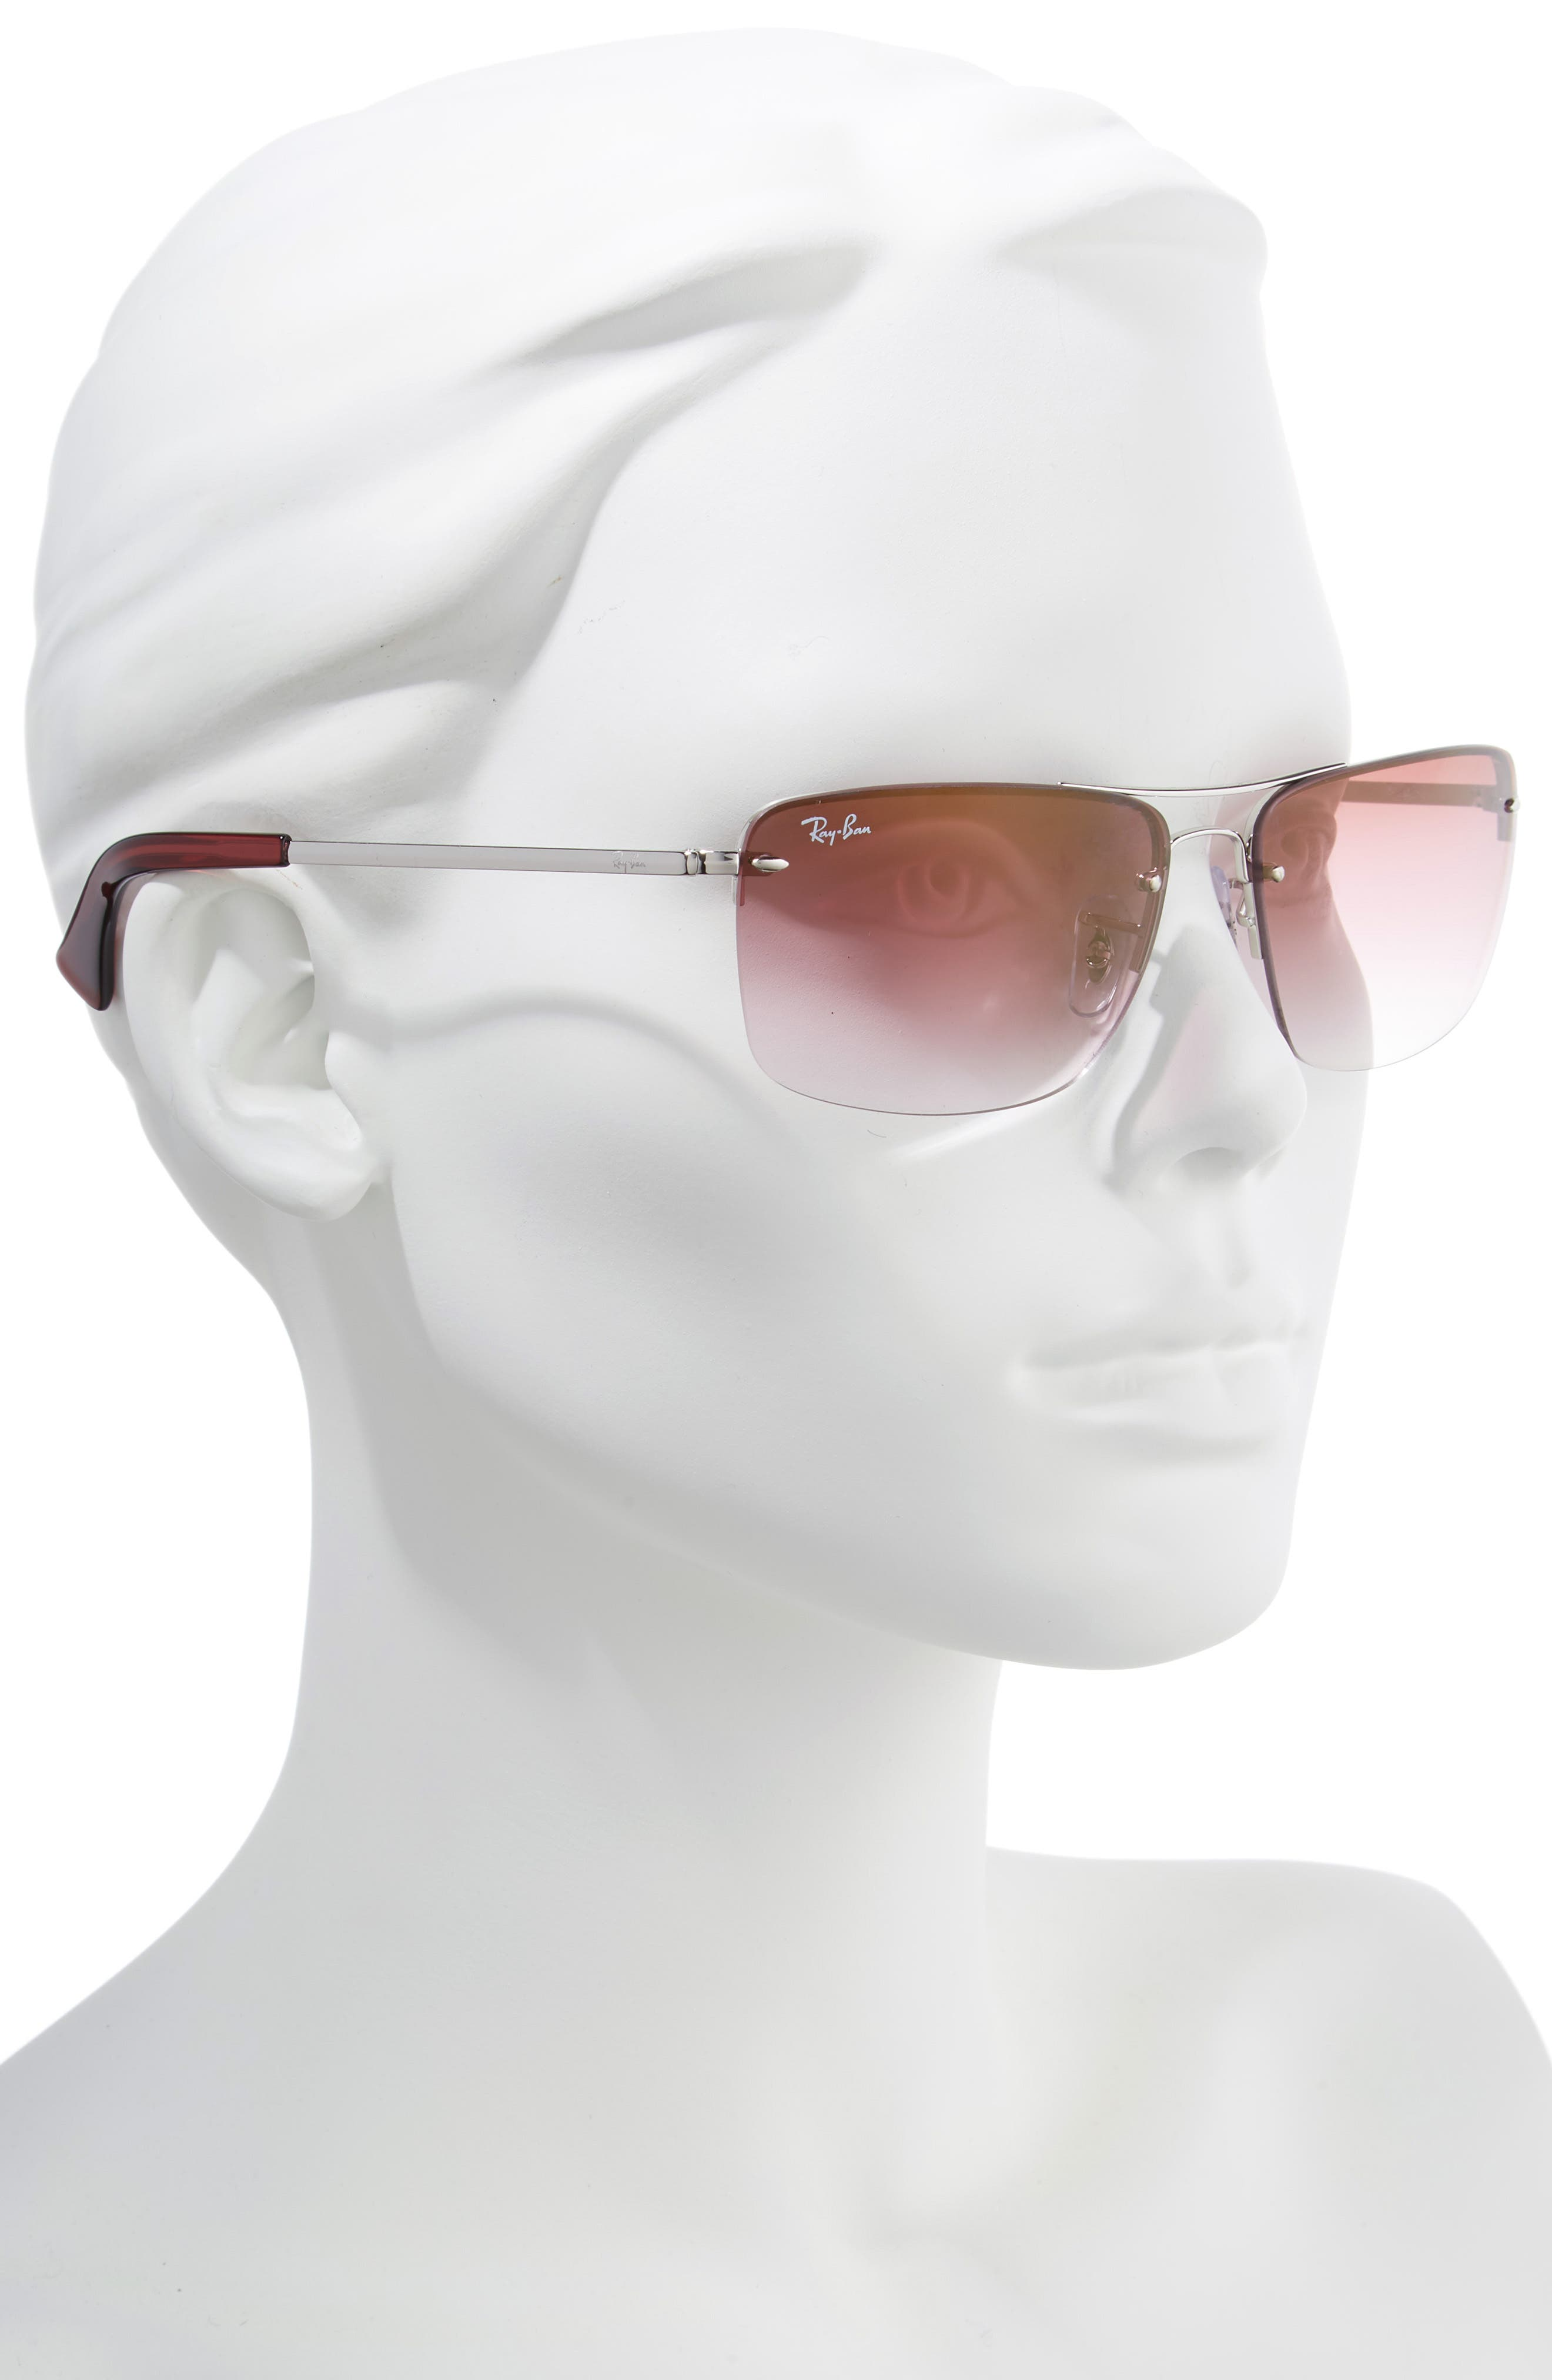 61mm Rimless Navigator Sunglasses,                             Alternate thumbnail 2, color,                             SILVER/ BORDEAUX GRADIENT